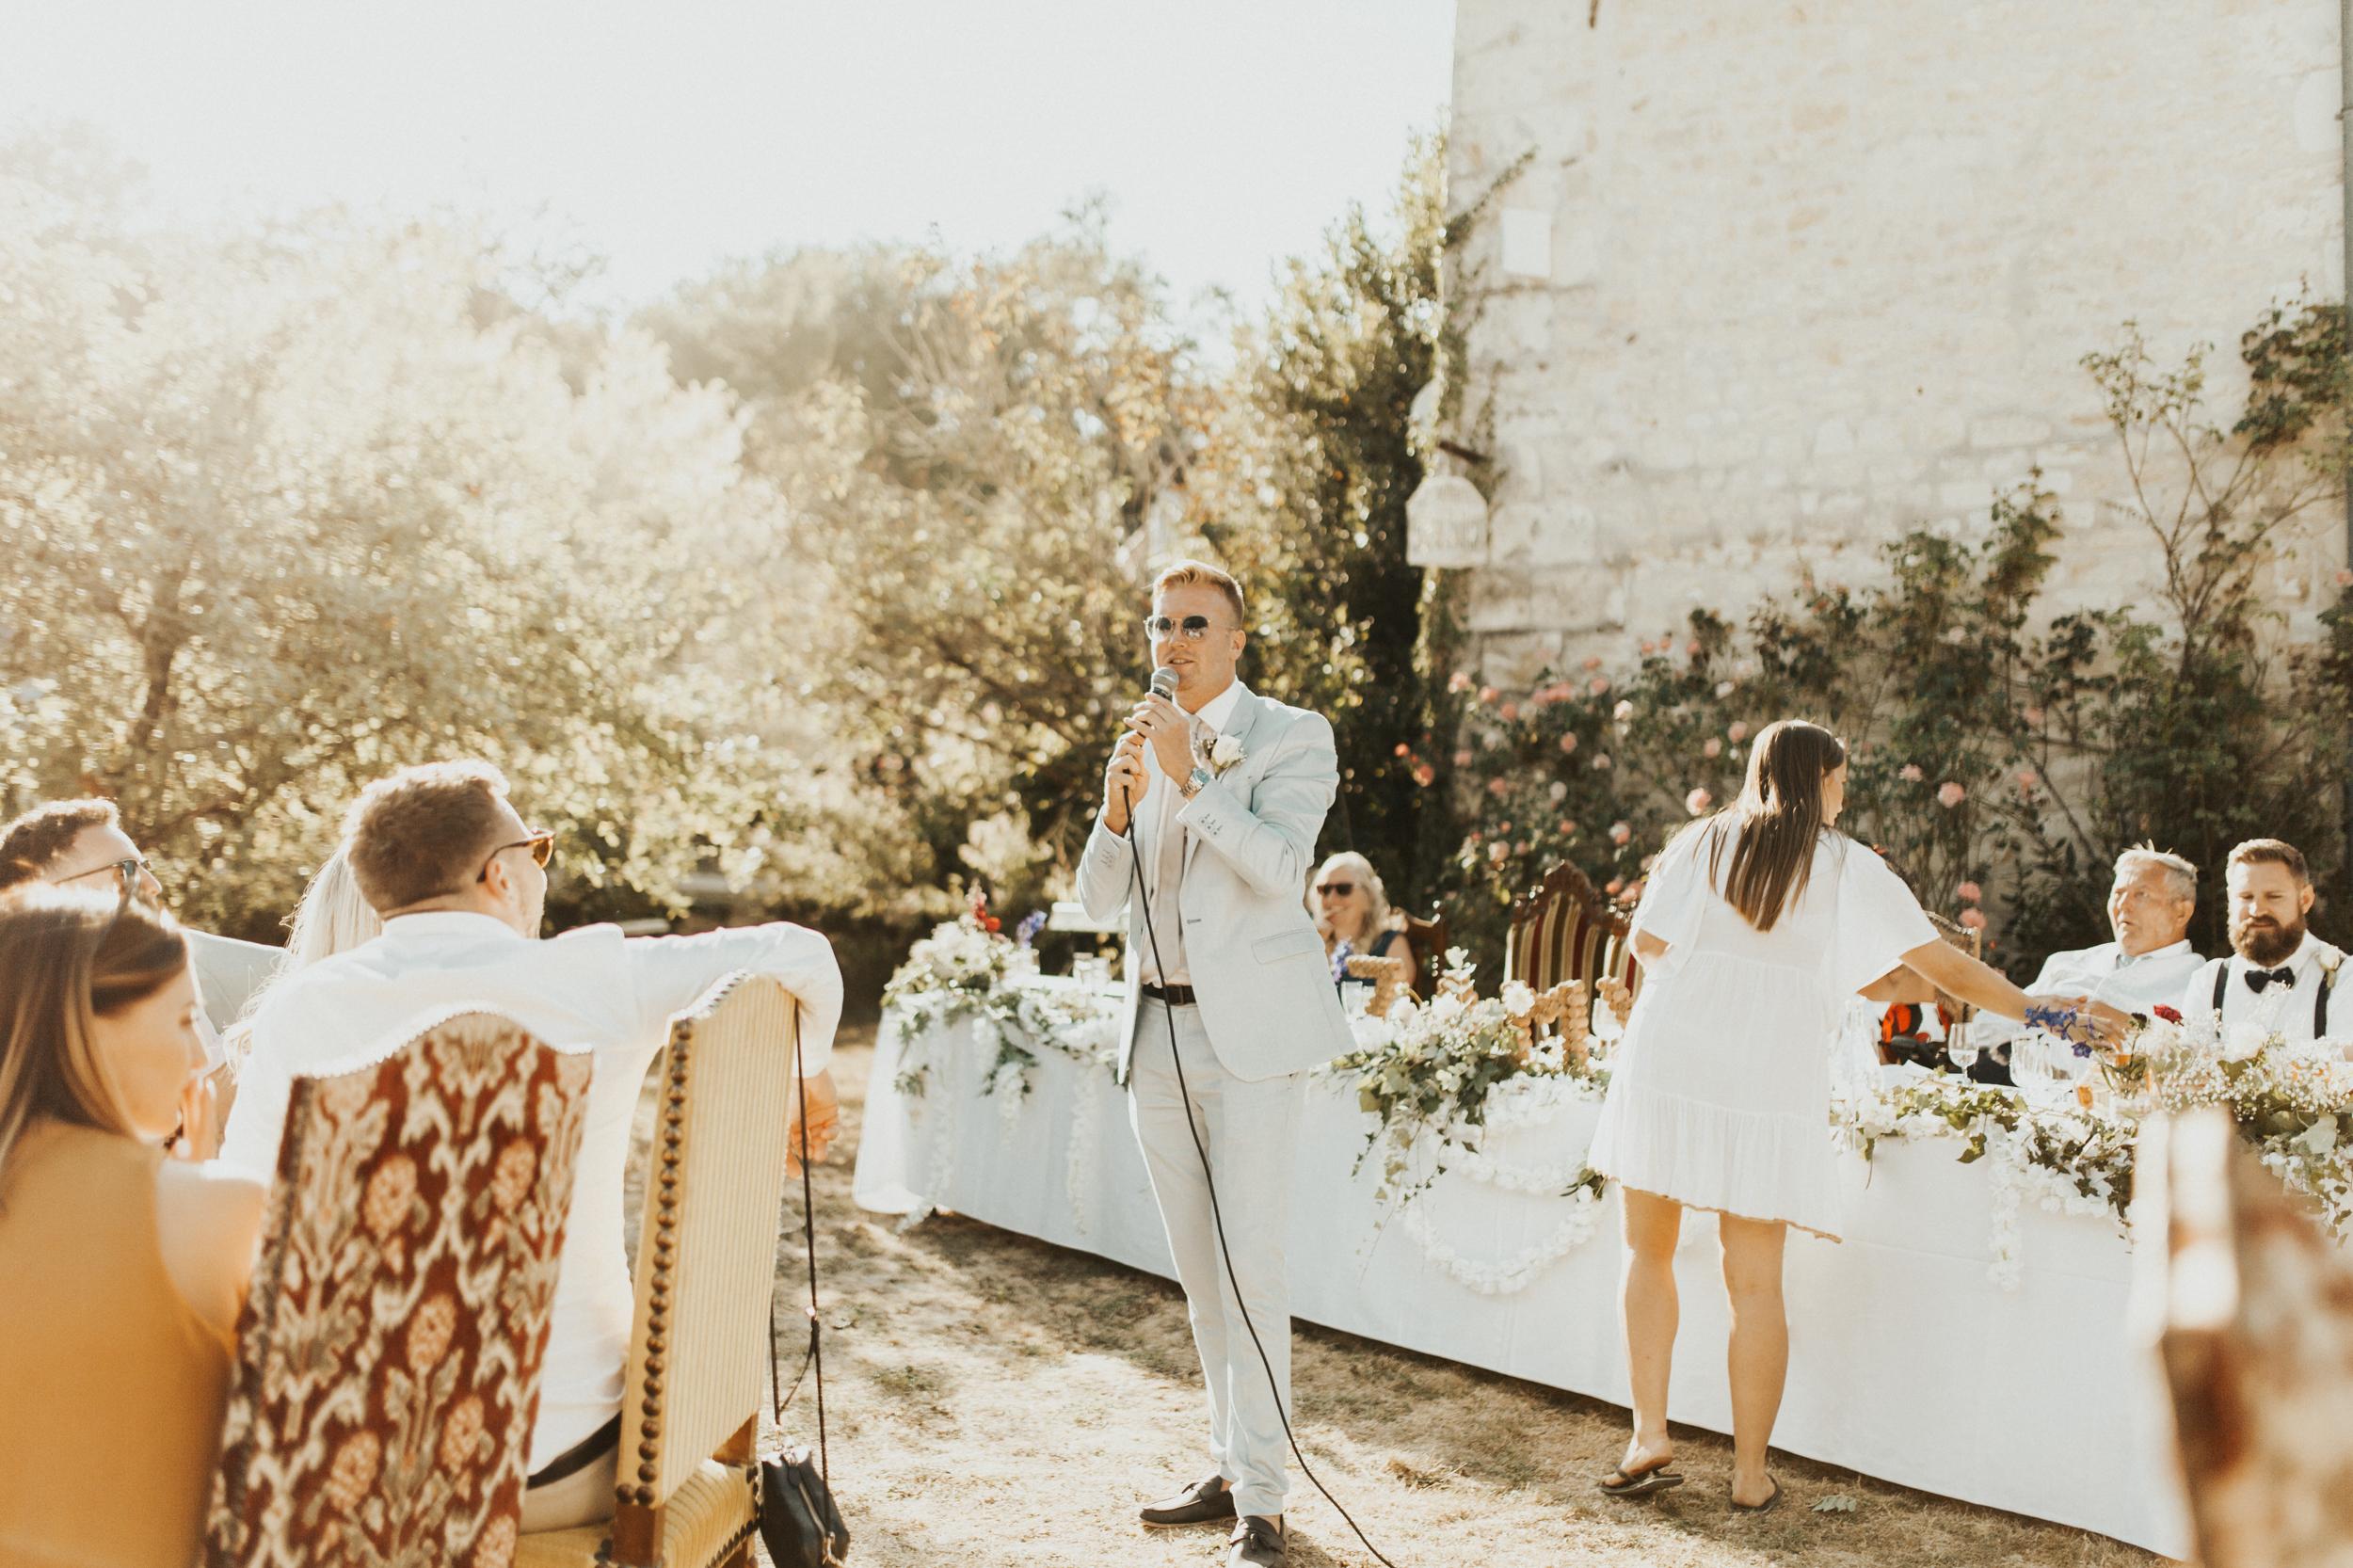 Amy-Zac-Destination-Wedding-France-Manoir-Foulquetiere-Darina-Stoda-Photography-74.jpg